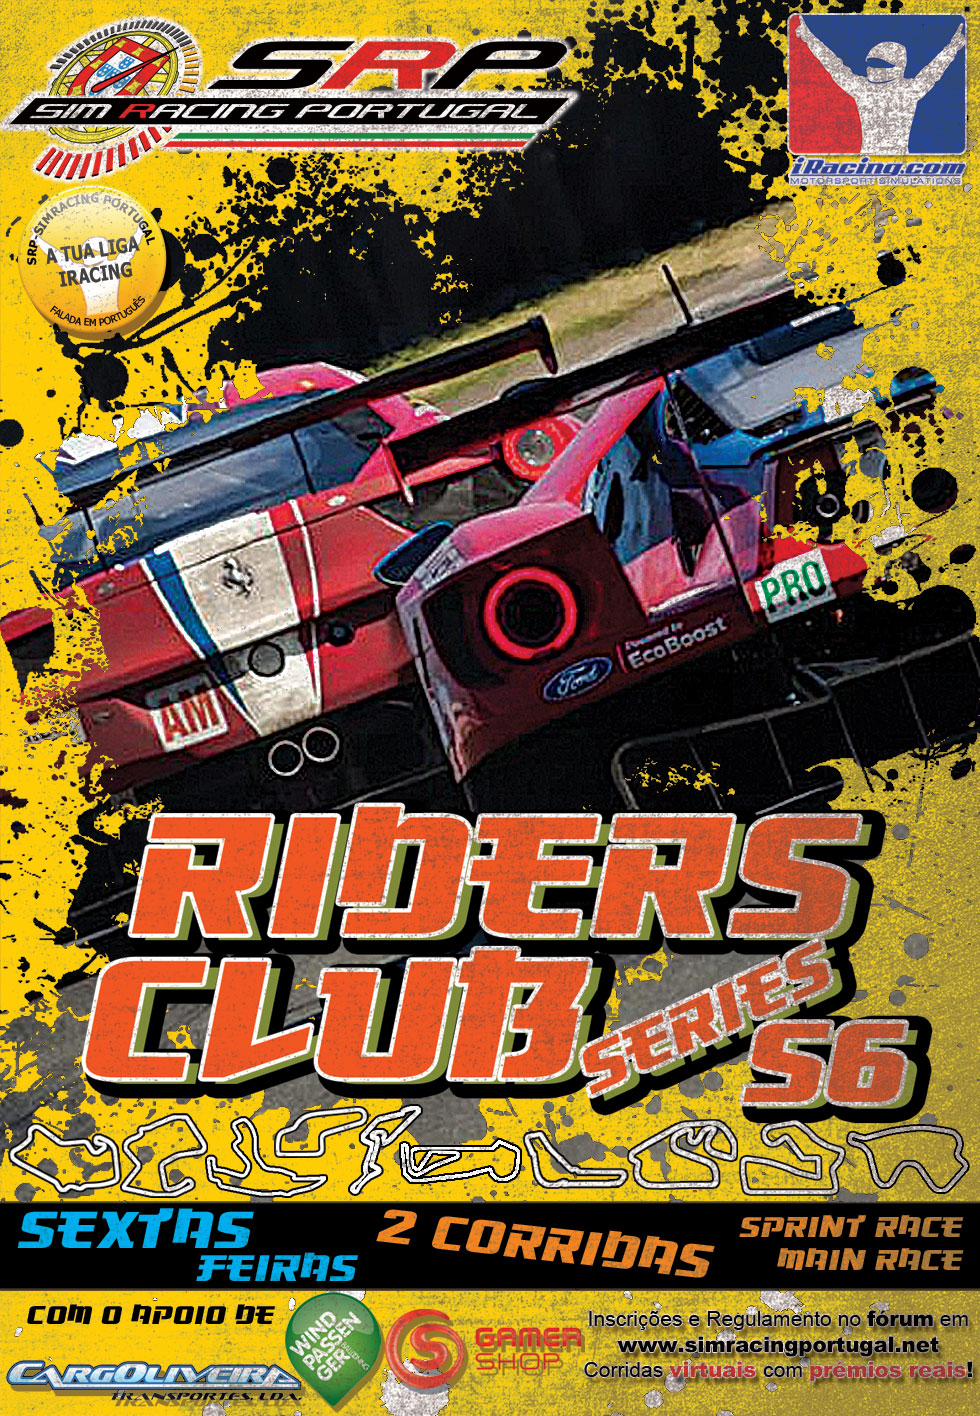 [Image: RidersClubSeriesS4.jpg]